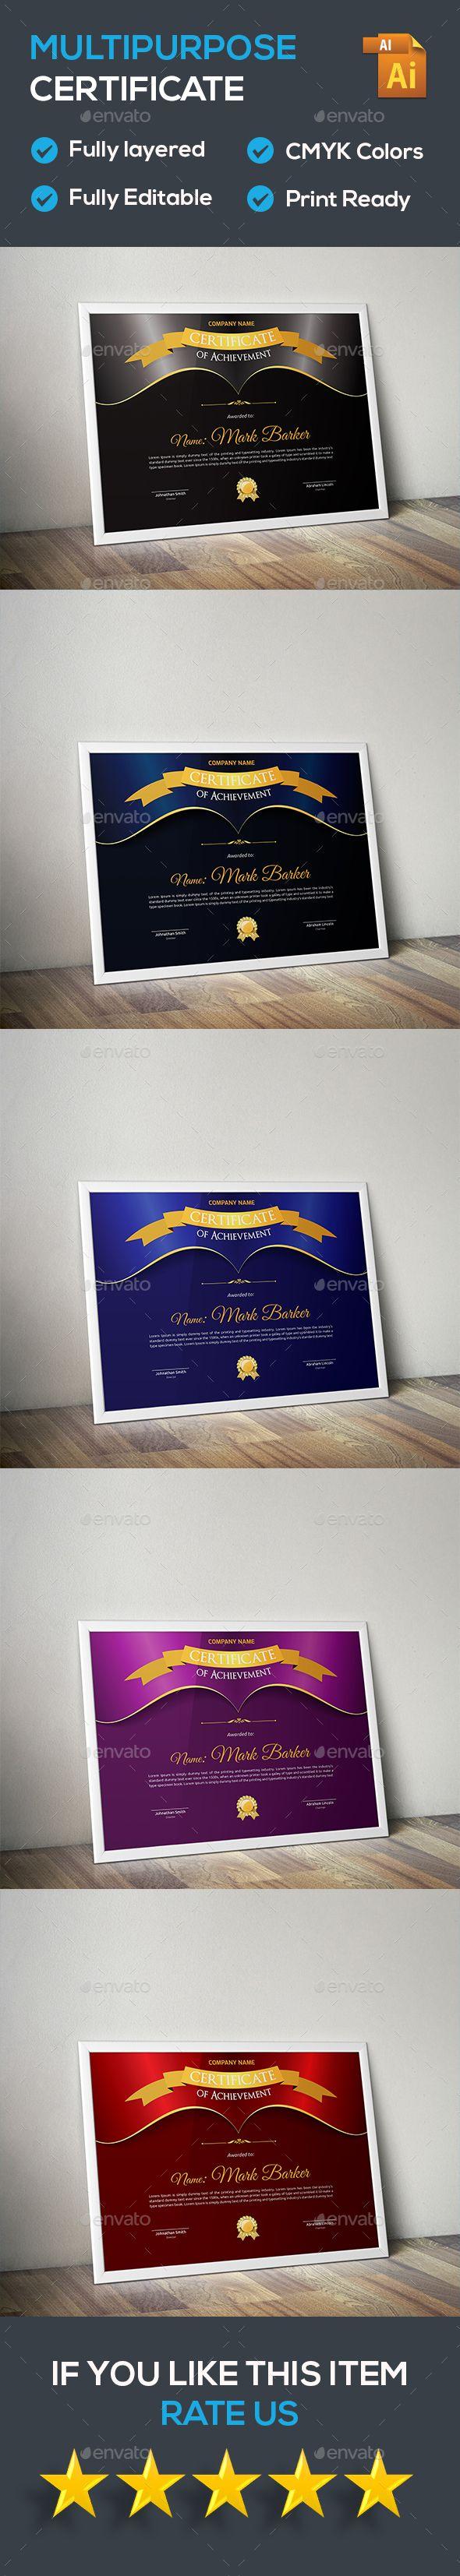 The 25 best graduation certificate template ideas on pinterest certificate certificate templatescertificate designinfographic templatesepsfont yadclub Gallery